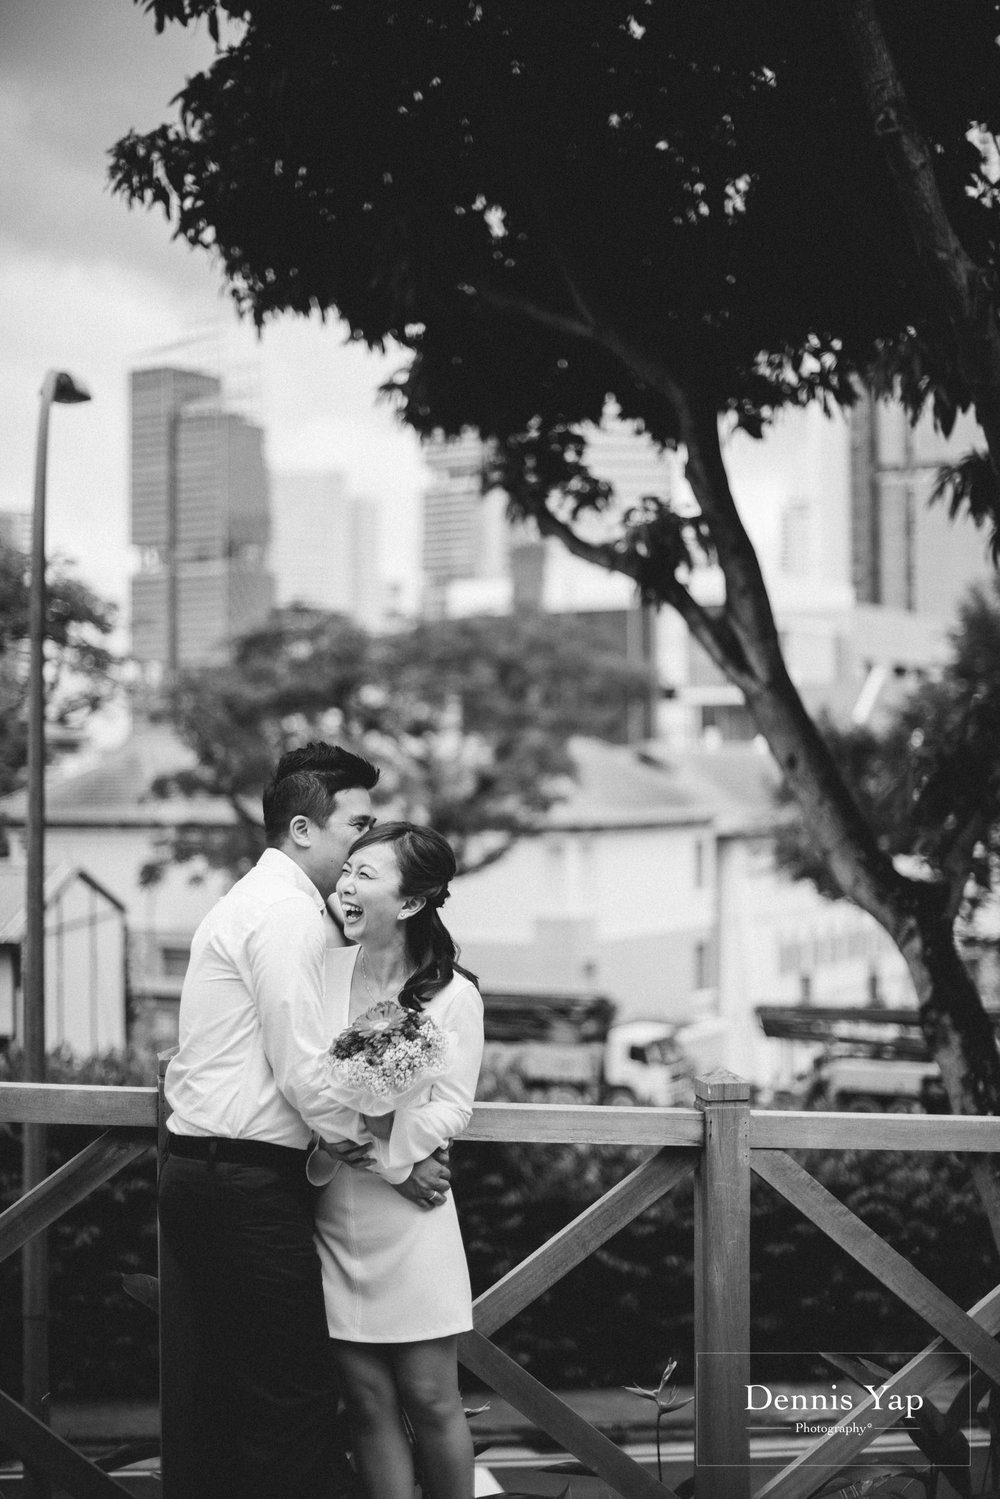 alex eivan rom singapore real love works dennis yap photography-8.jpg